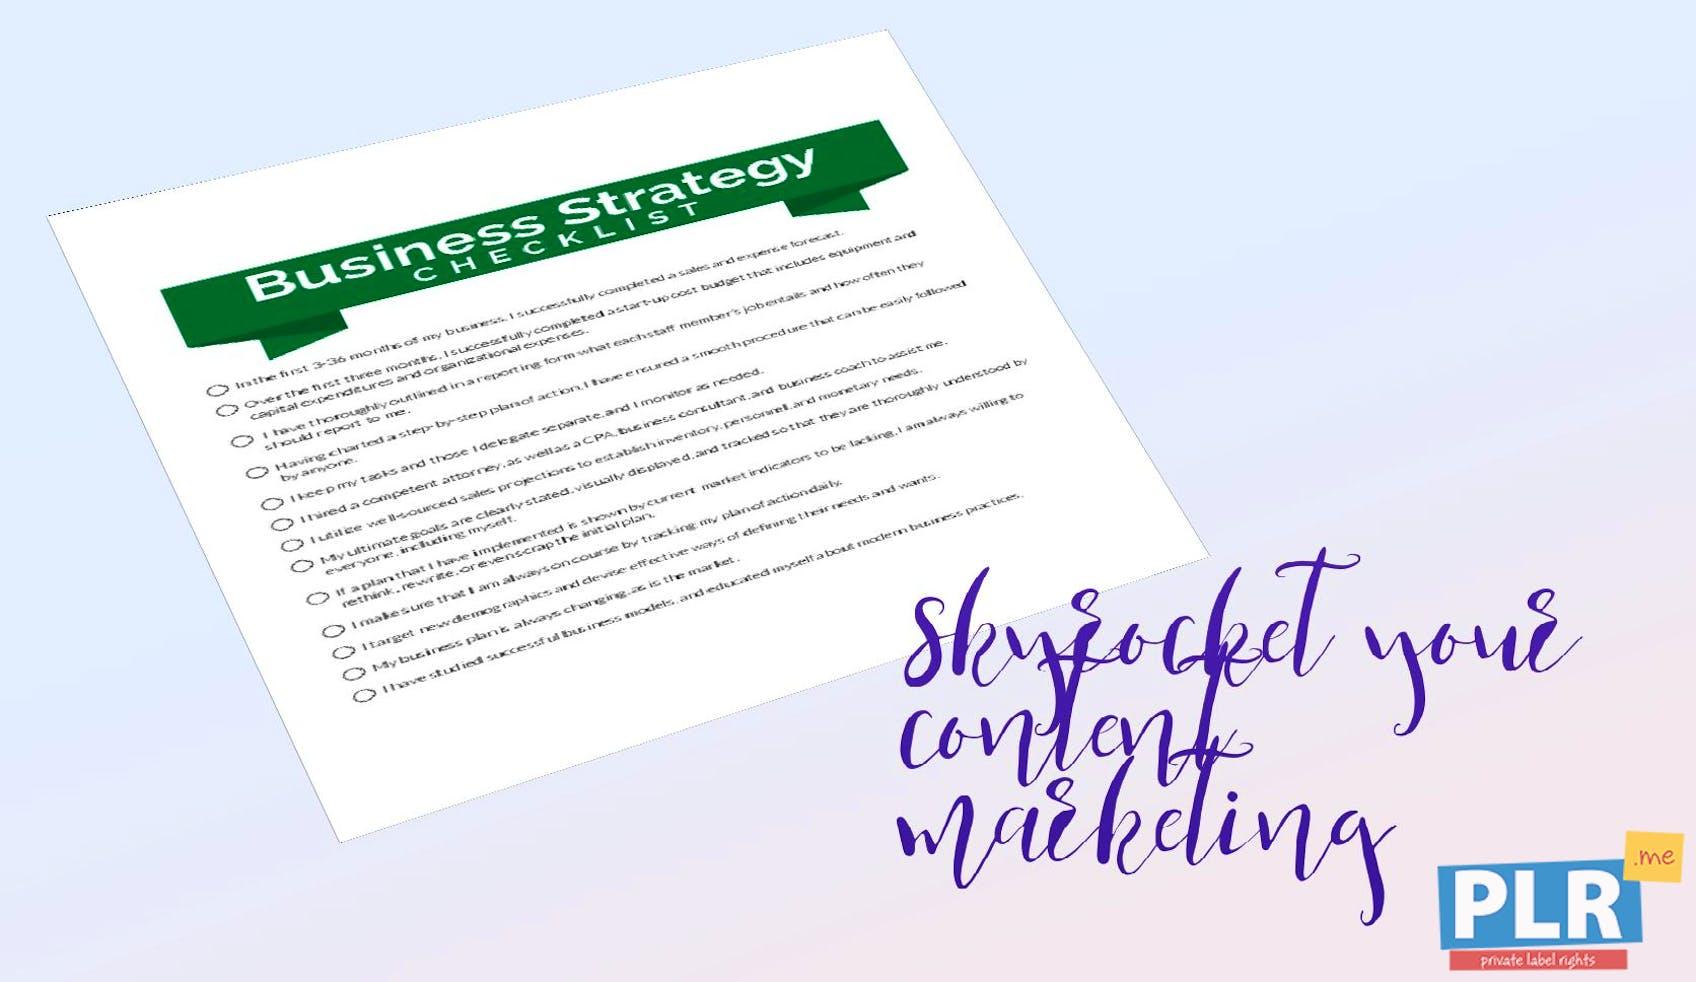 plr checklists business strategy checklist plr me